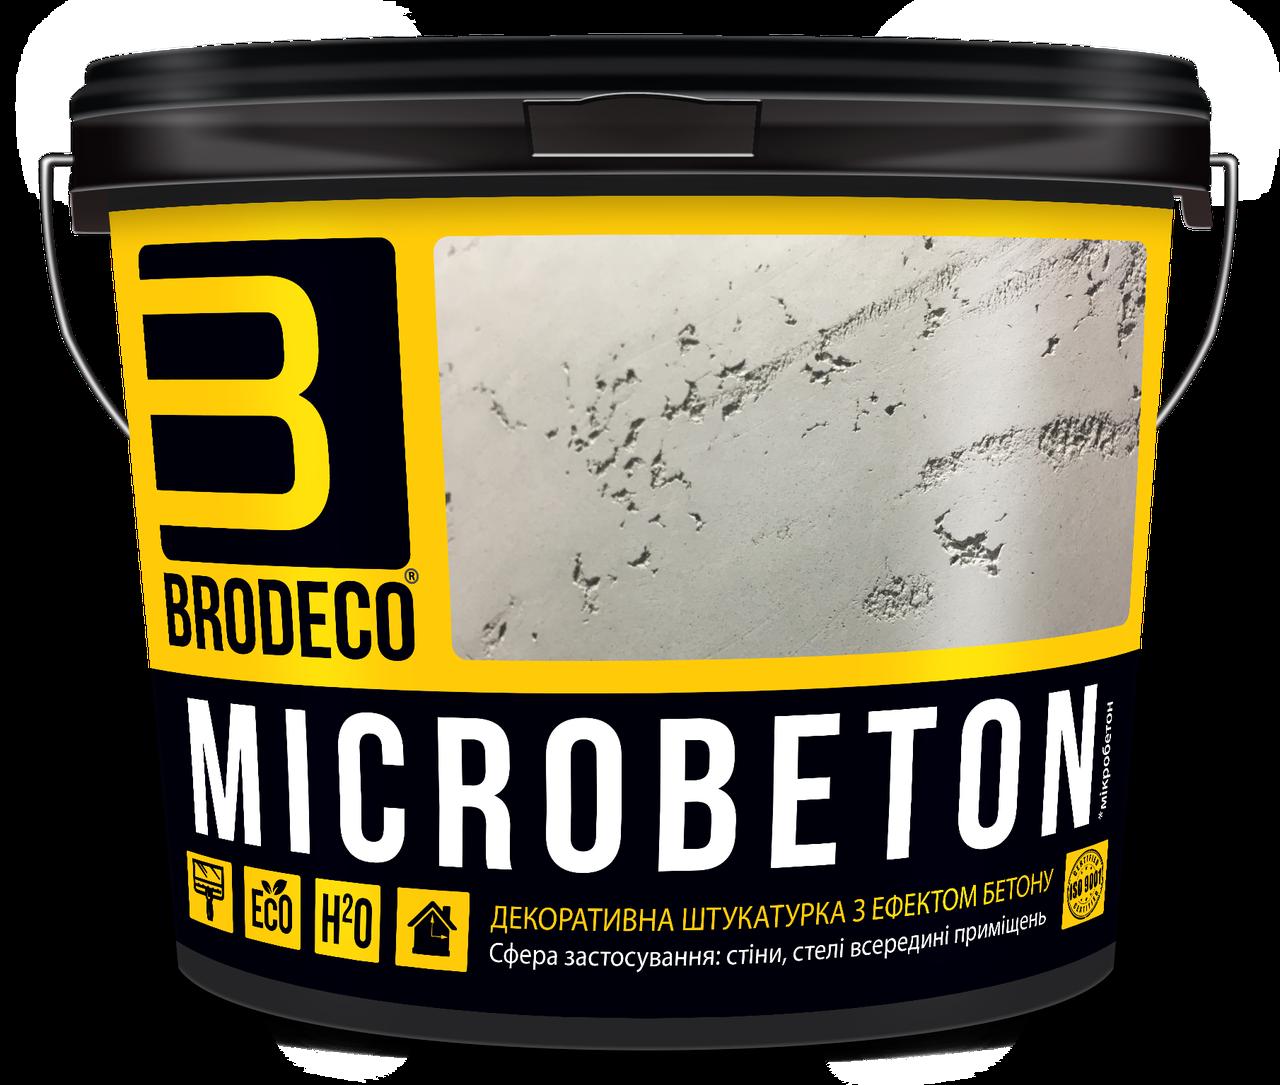 Декоративная штукатурка имитация бетона «Microbeton» TM Brodeco 15 кг